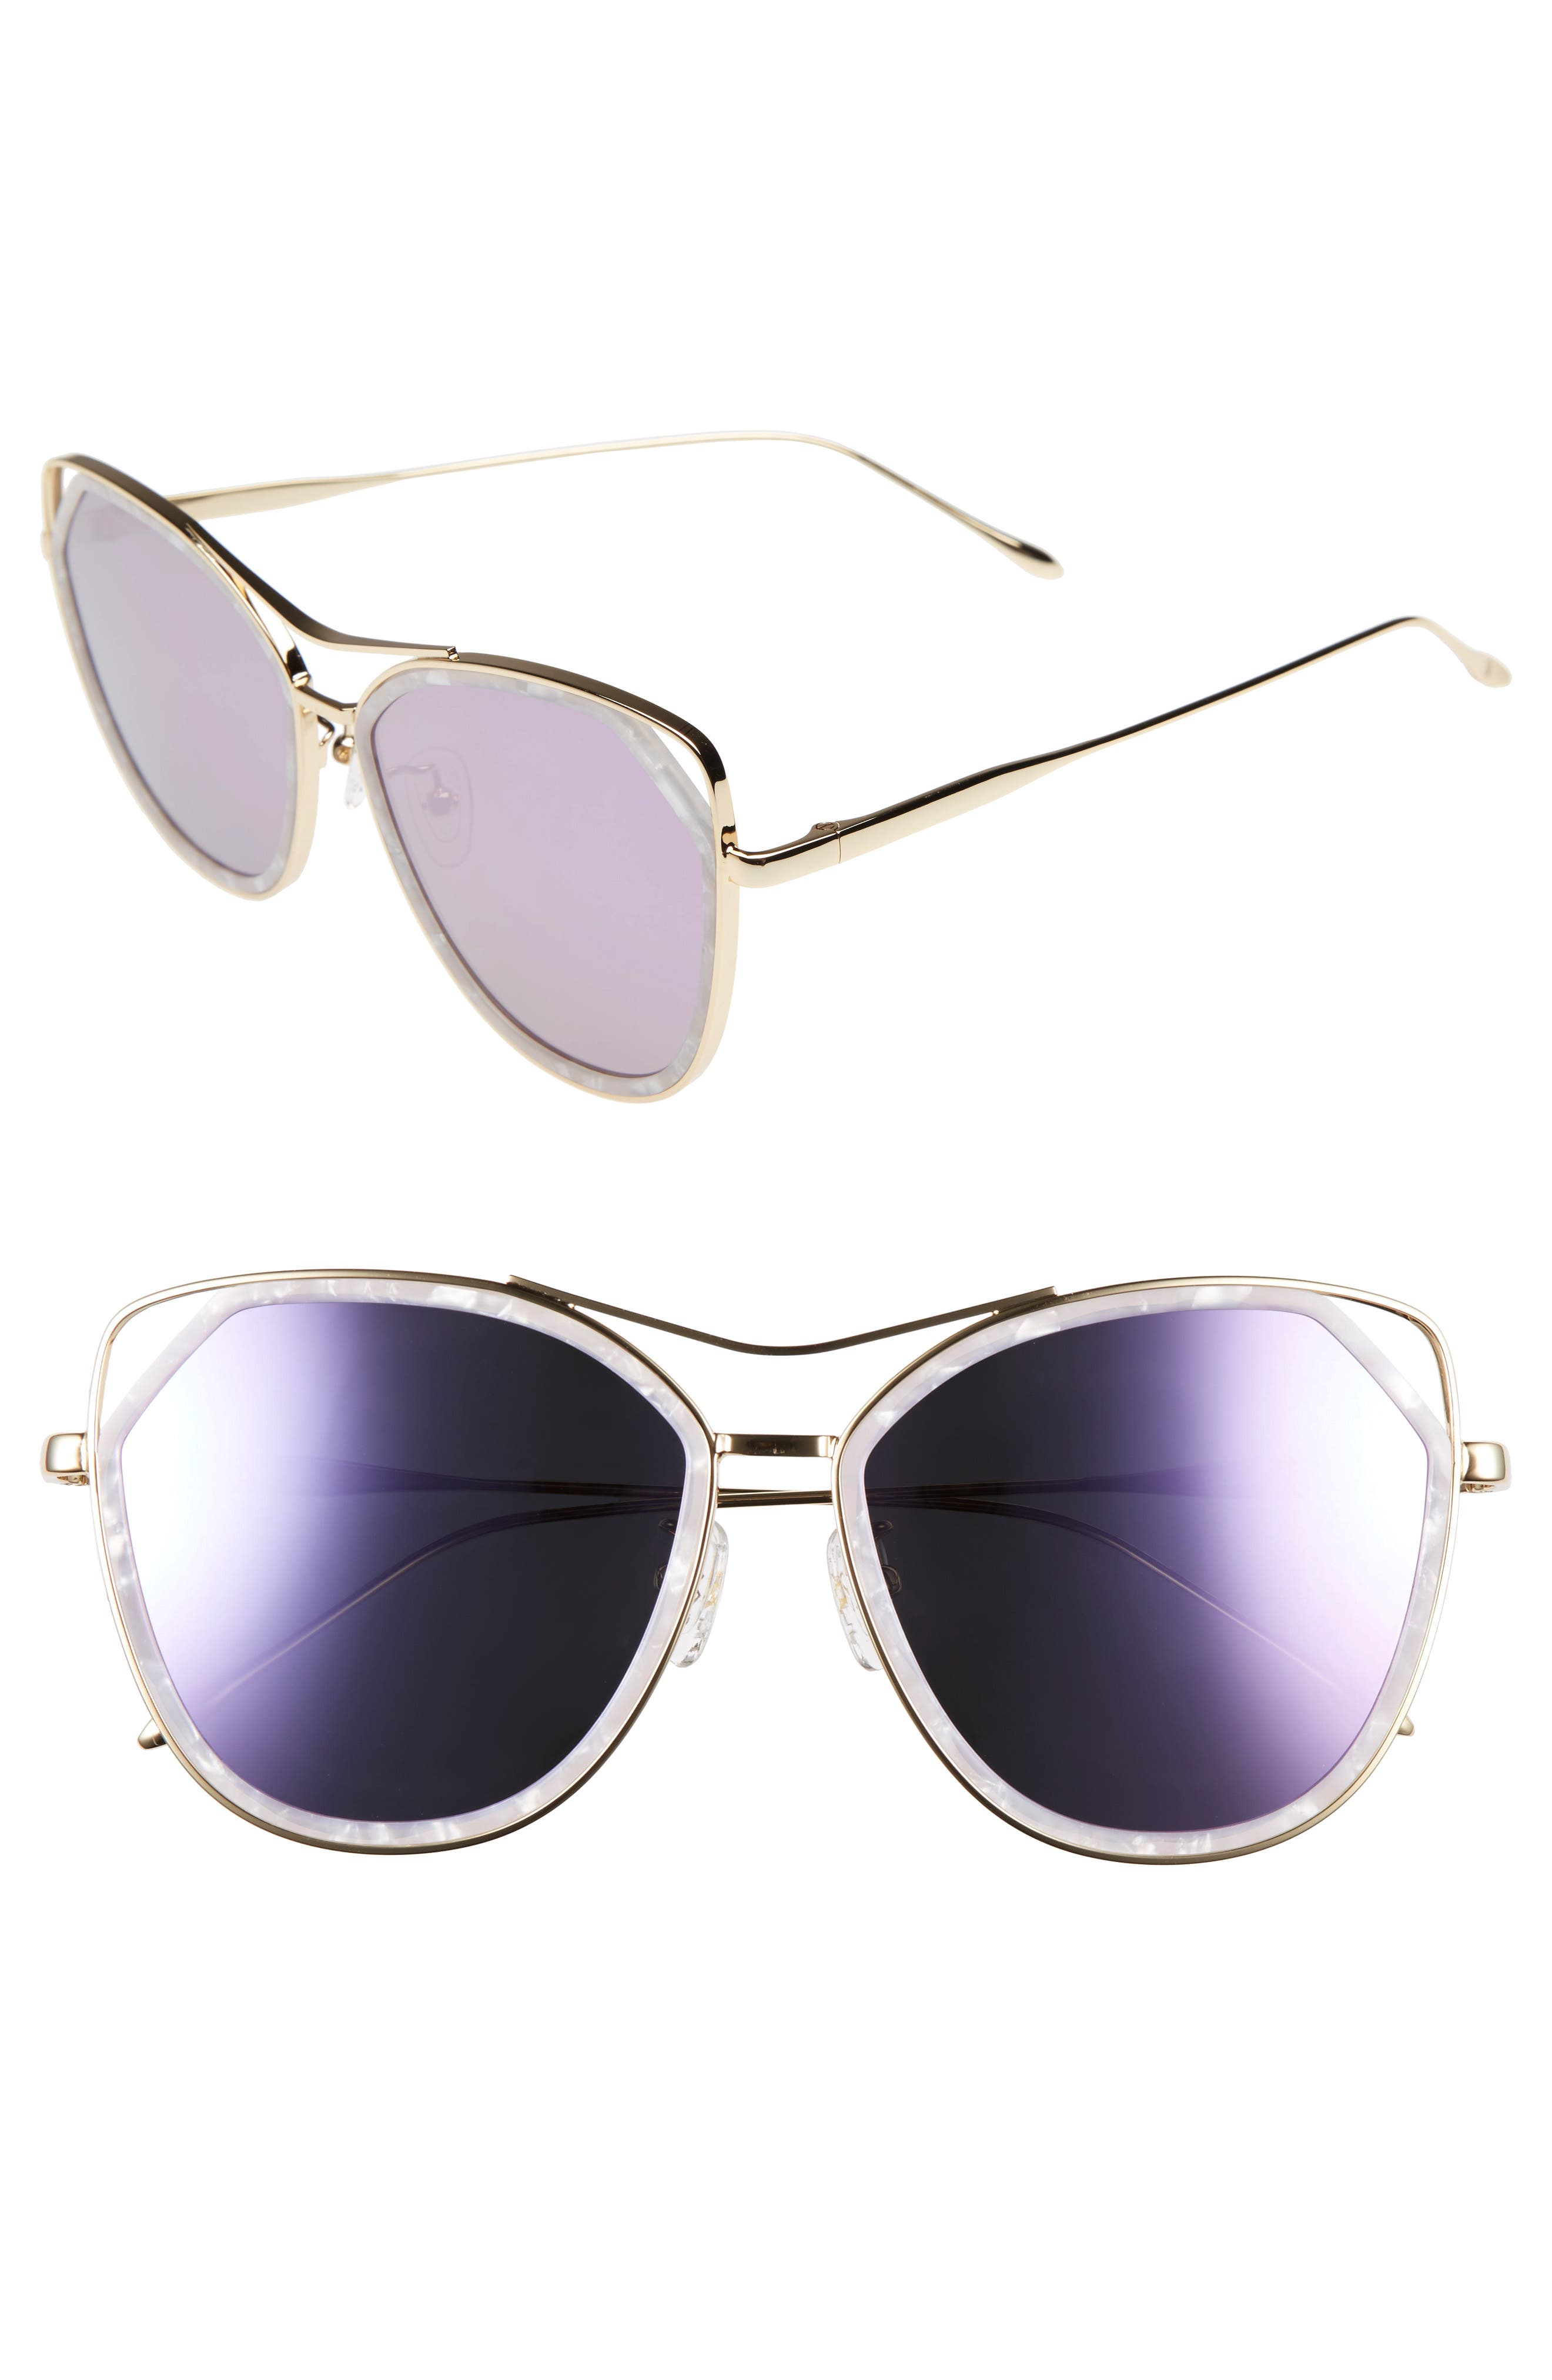 Bonnie Clyde Grand 56mm Polarized Cat Eye Sunglasses